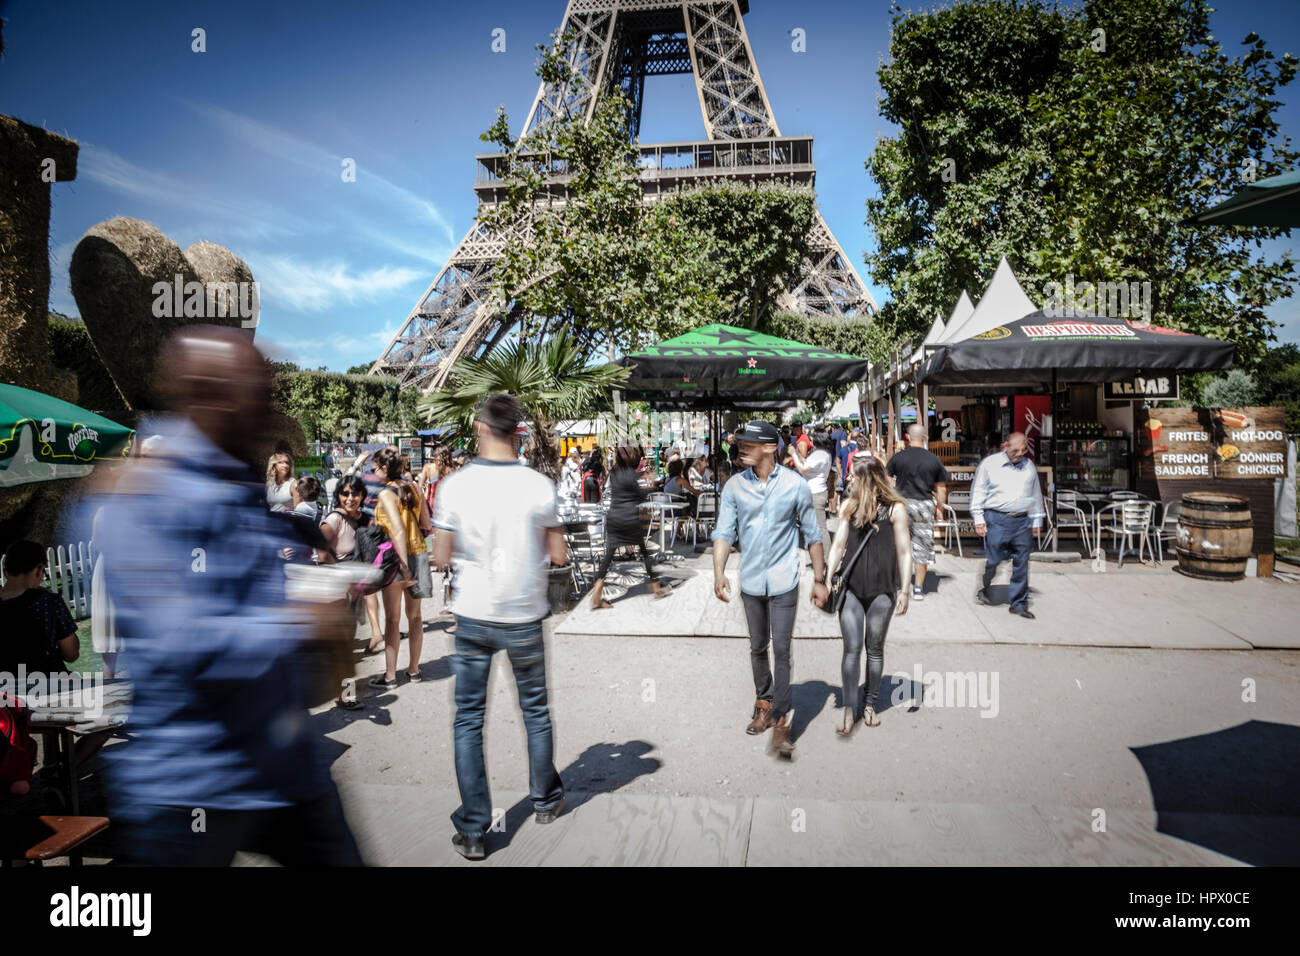 Street Market at Champ de Mars, Paris, France - Stock Image